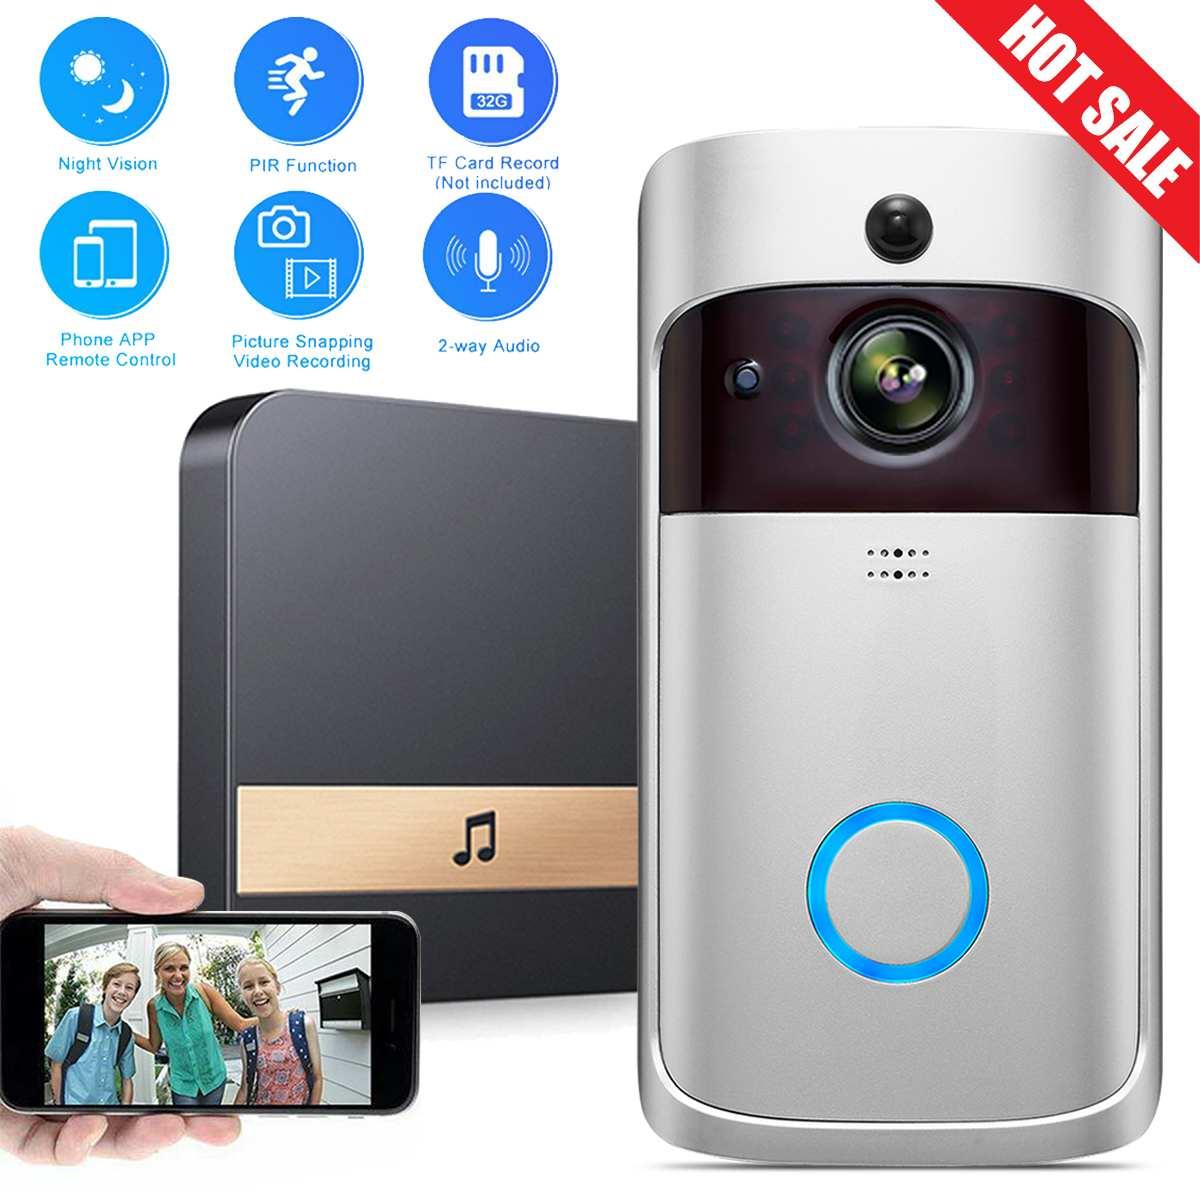 Video Doorbell Wireless 720P 2.4G WiFi Real Time 2Way Talk Voice Intercom Smart PIR Motion Detection Ring Doorbell Home Security